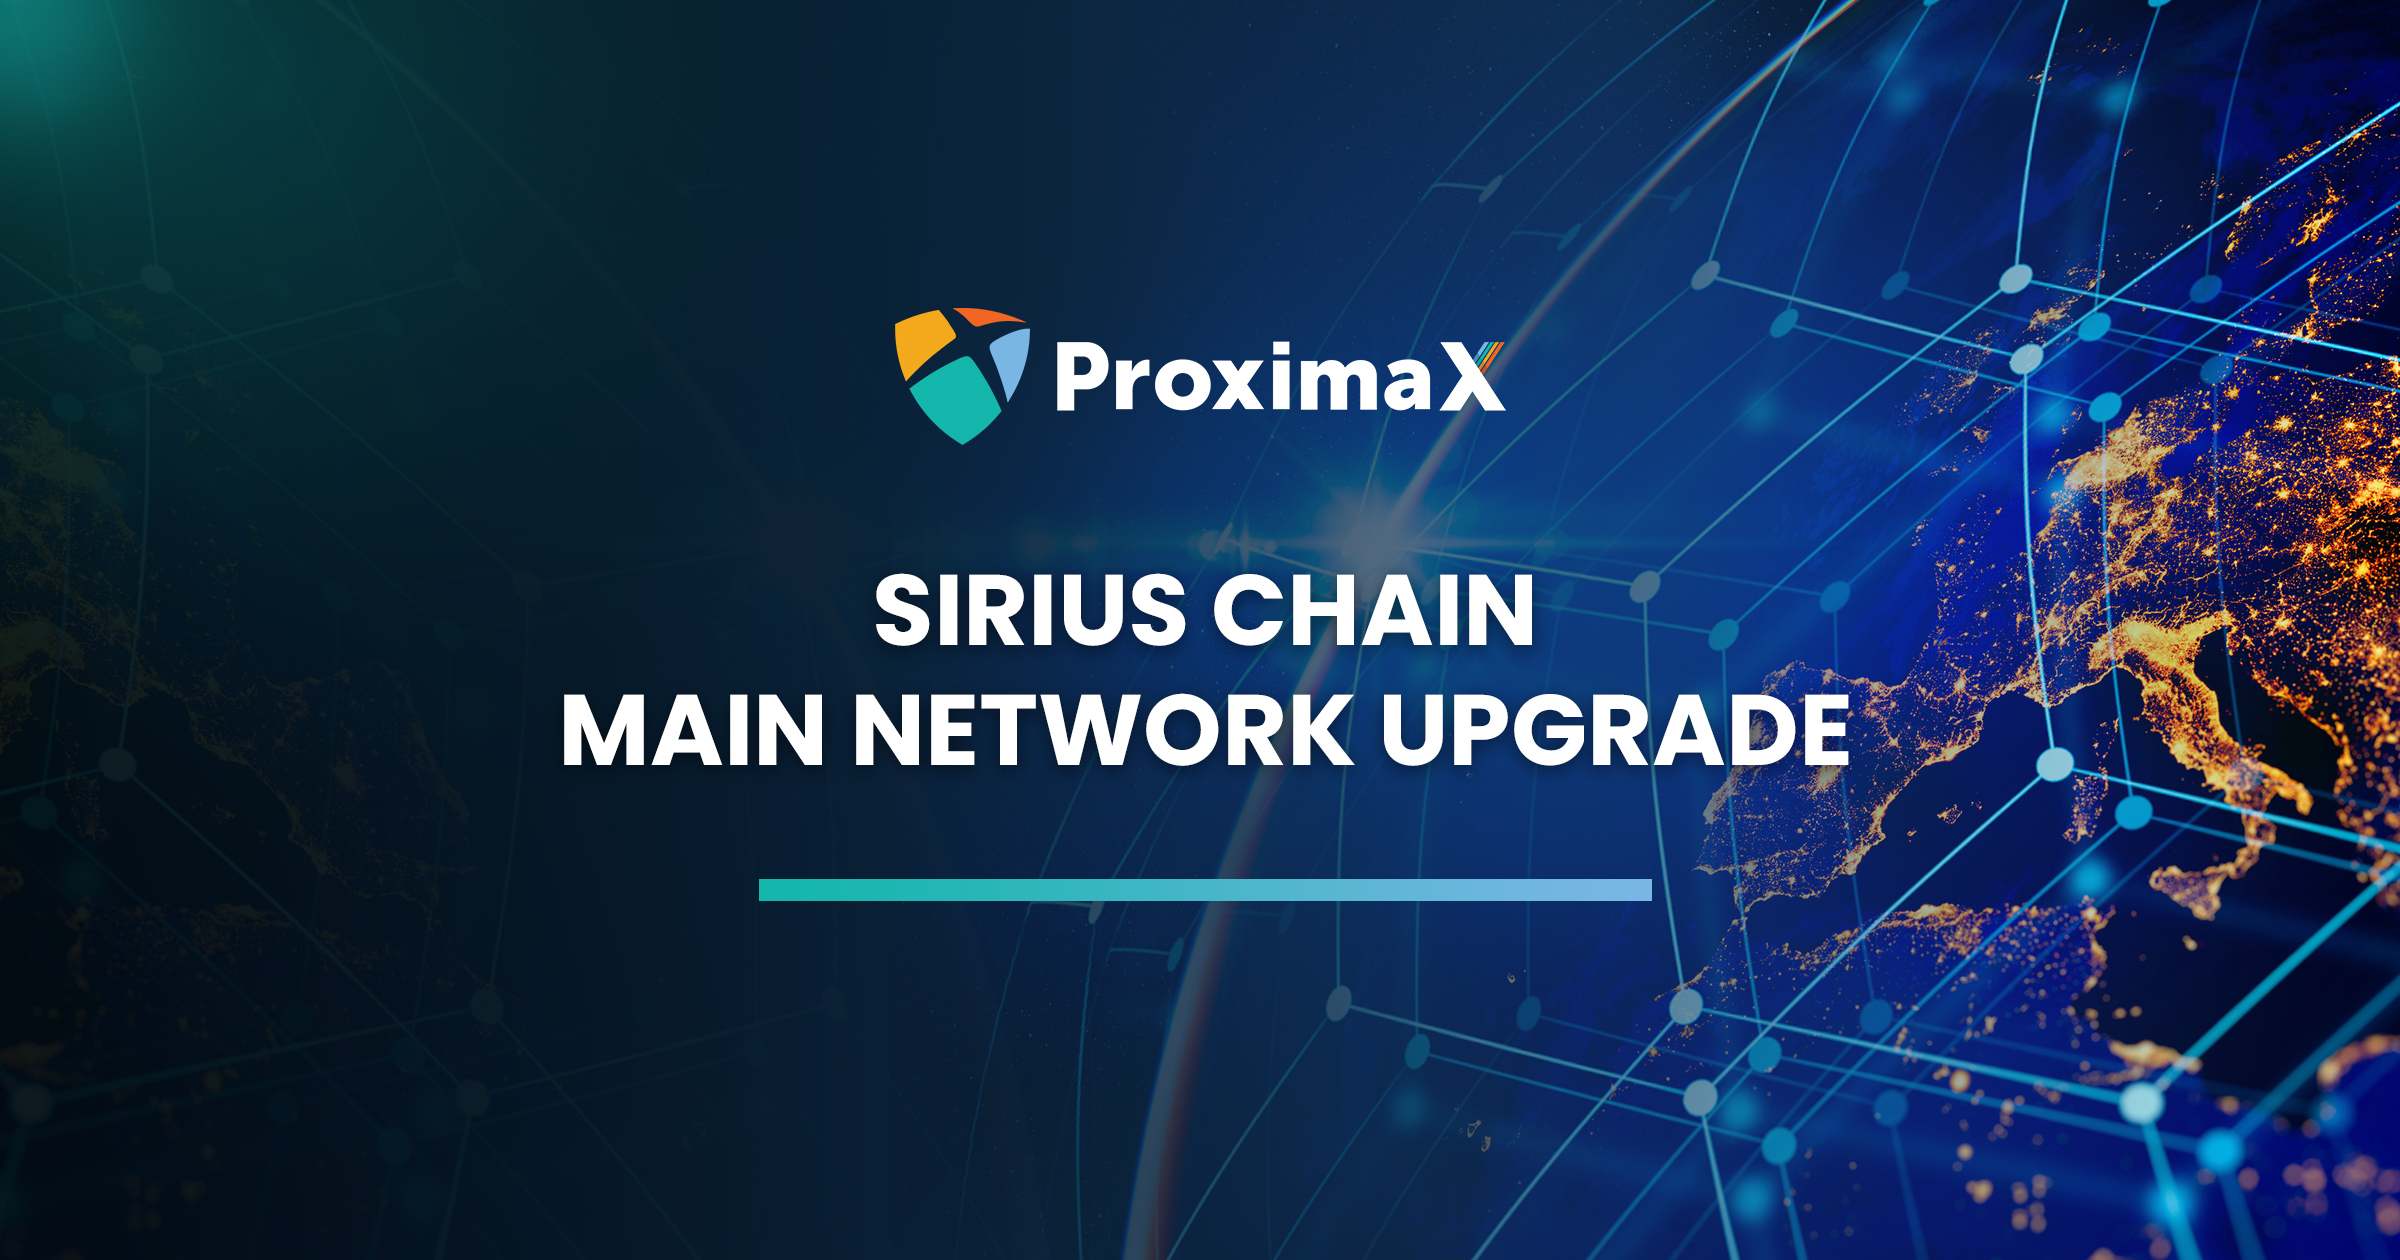 ProximaX Sirius Platform Main Network Upgrade